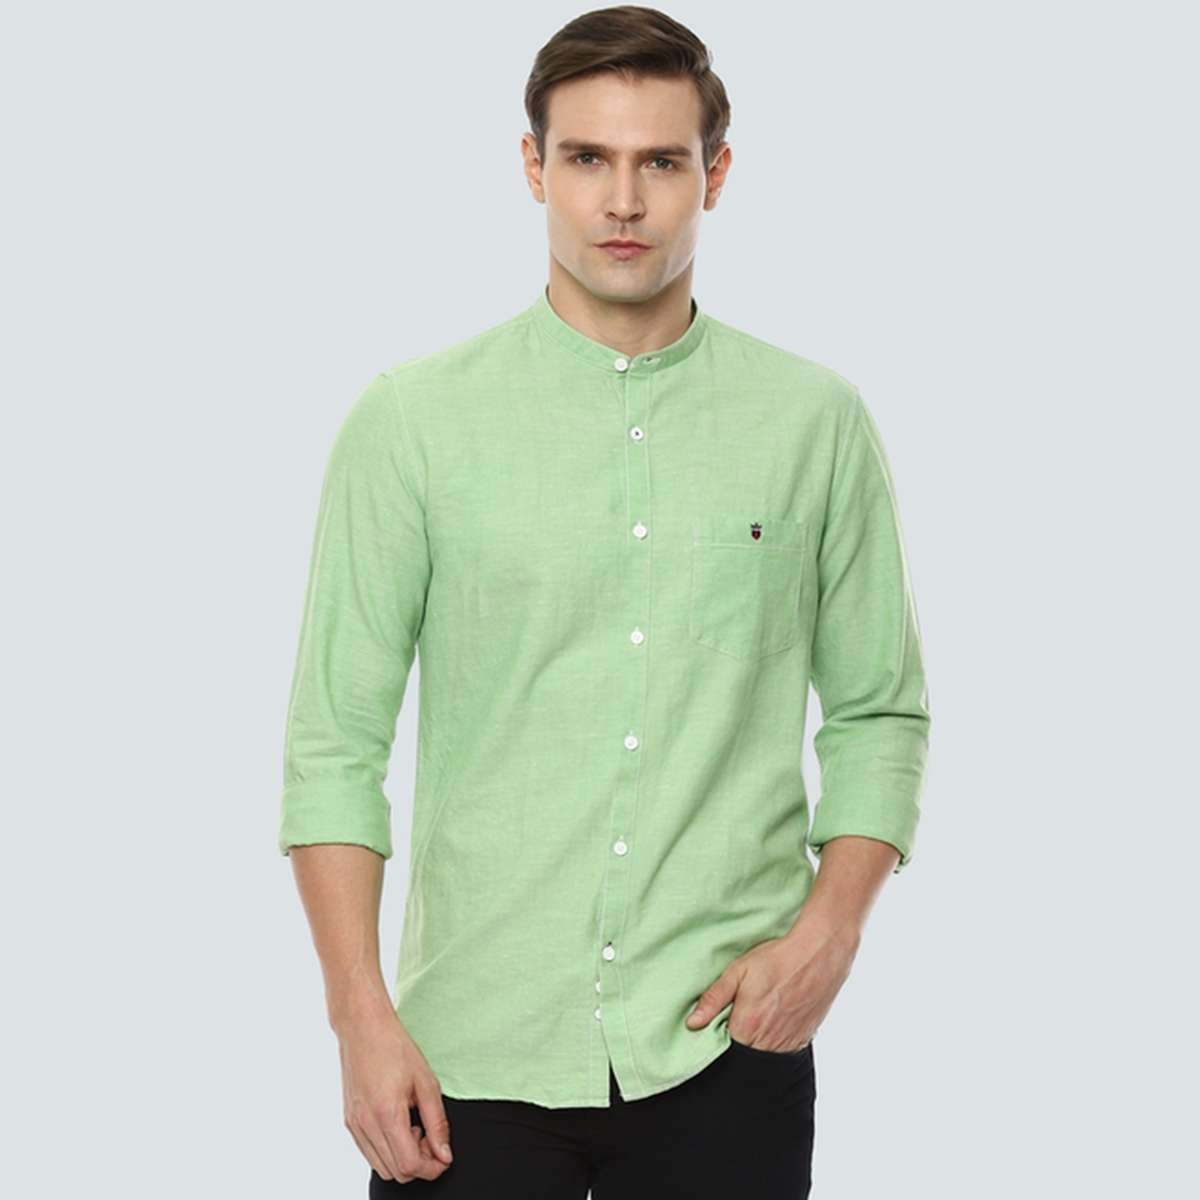 2.LP SPORT Men Solid Super Slim Fit Casual Shirt